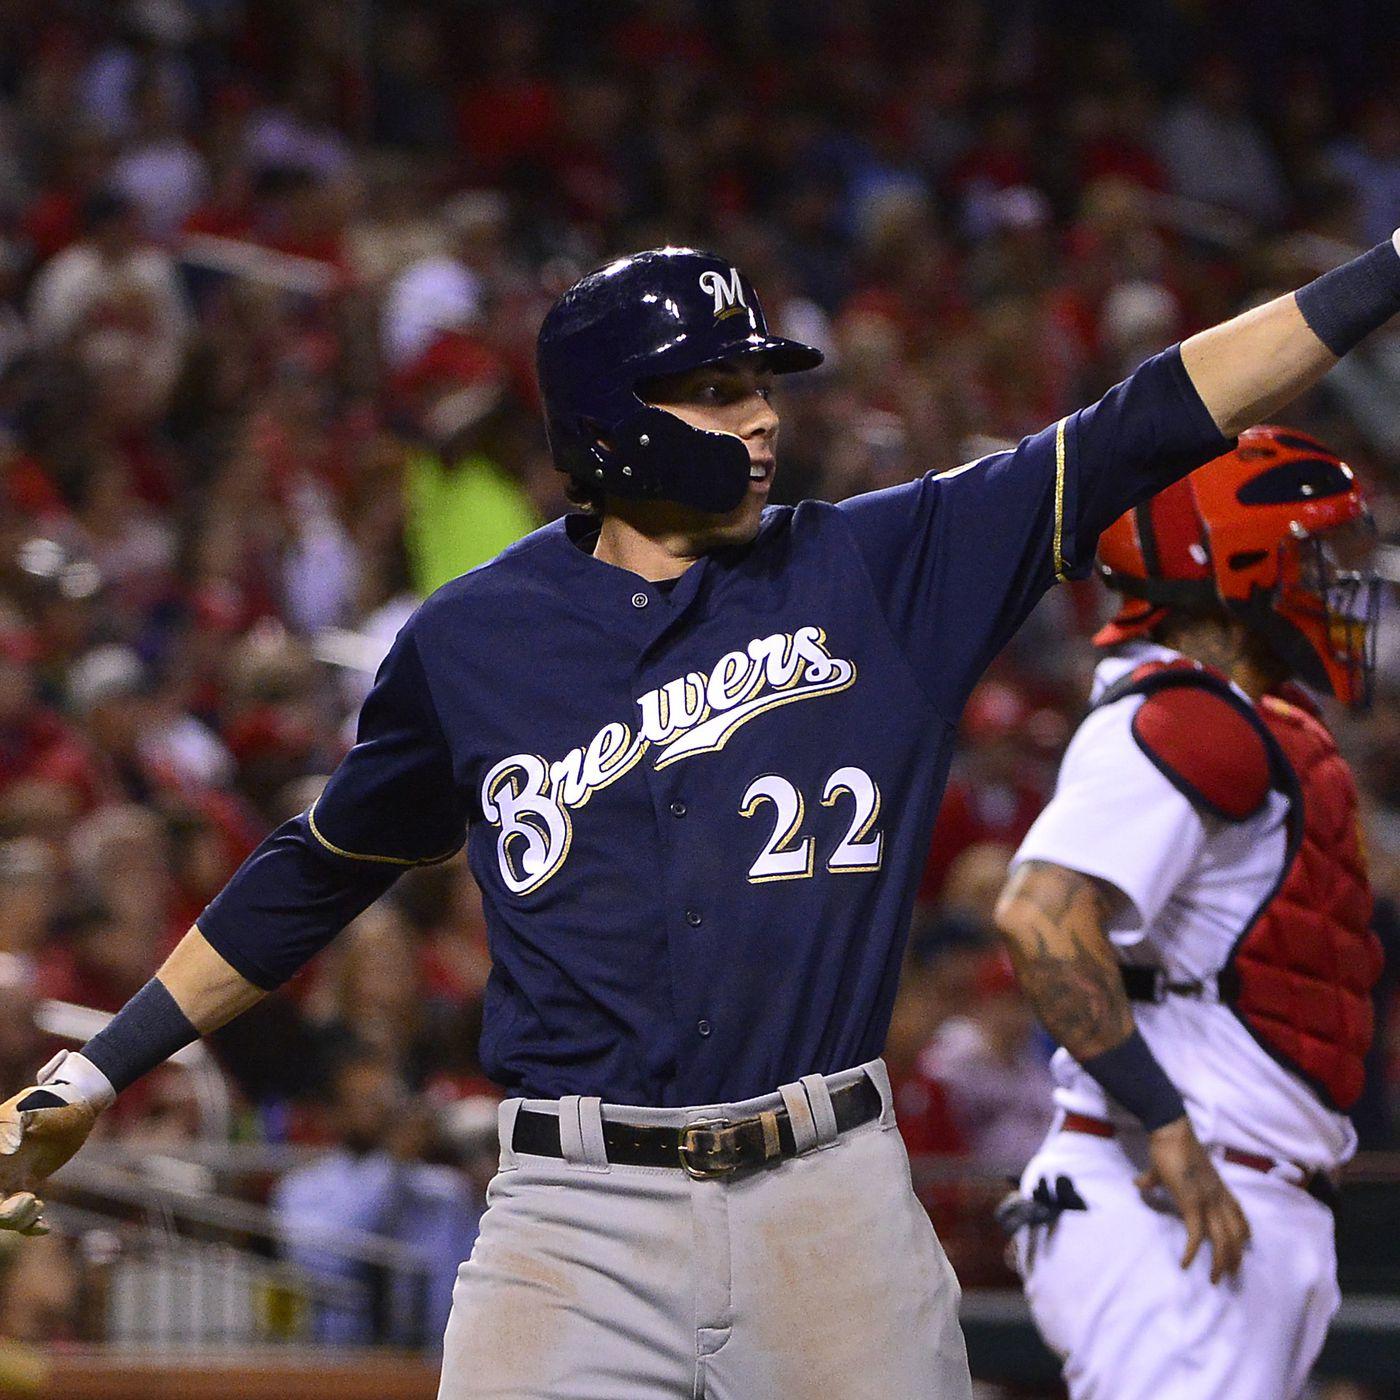 Christian Yelich Milwaukee Brewers New Arrivals Legend Baseball Player Jersey